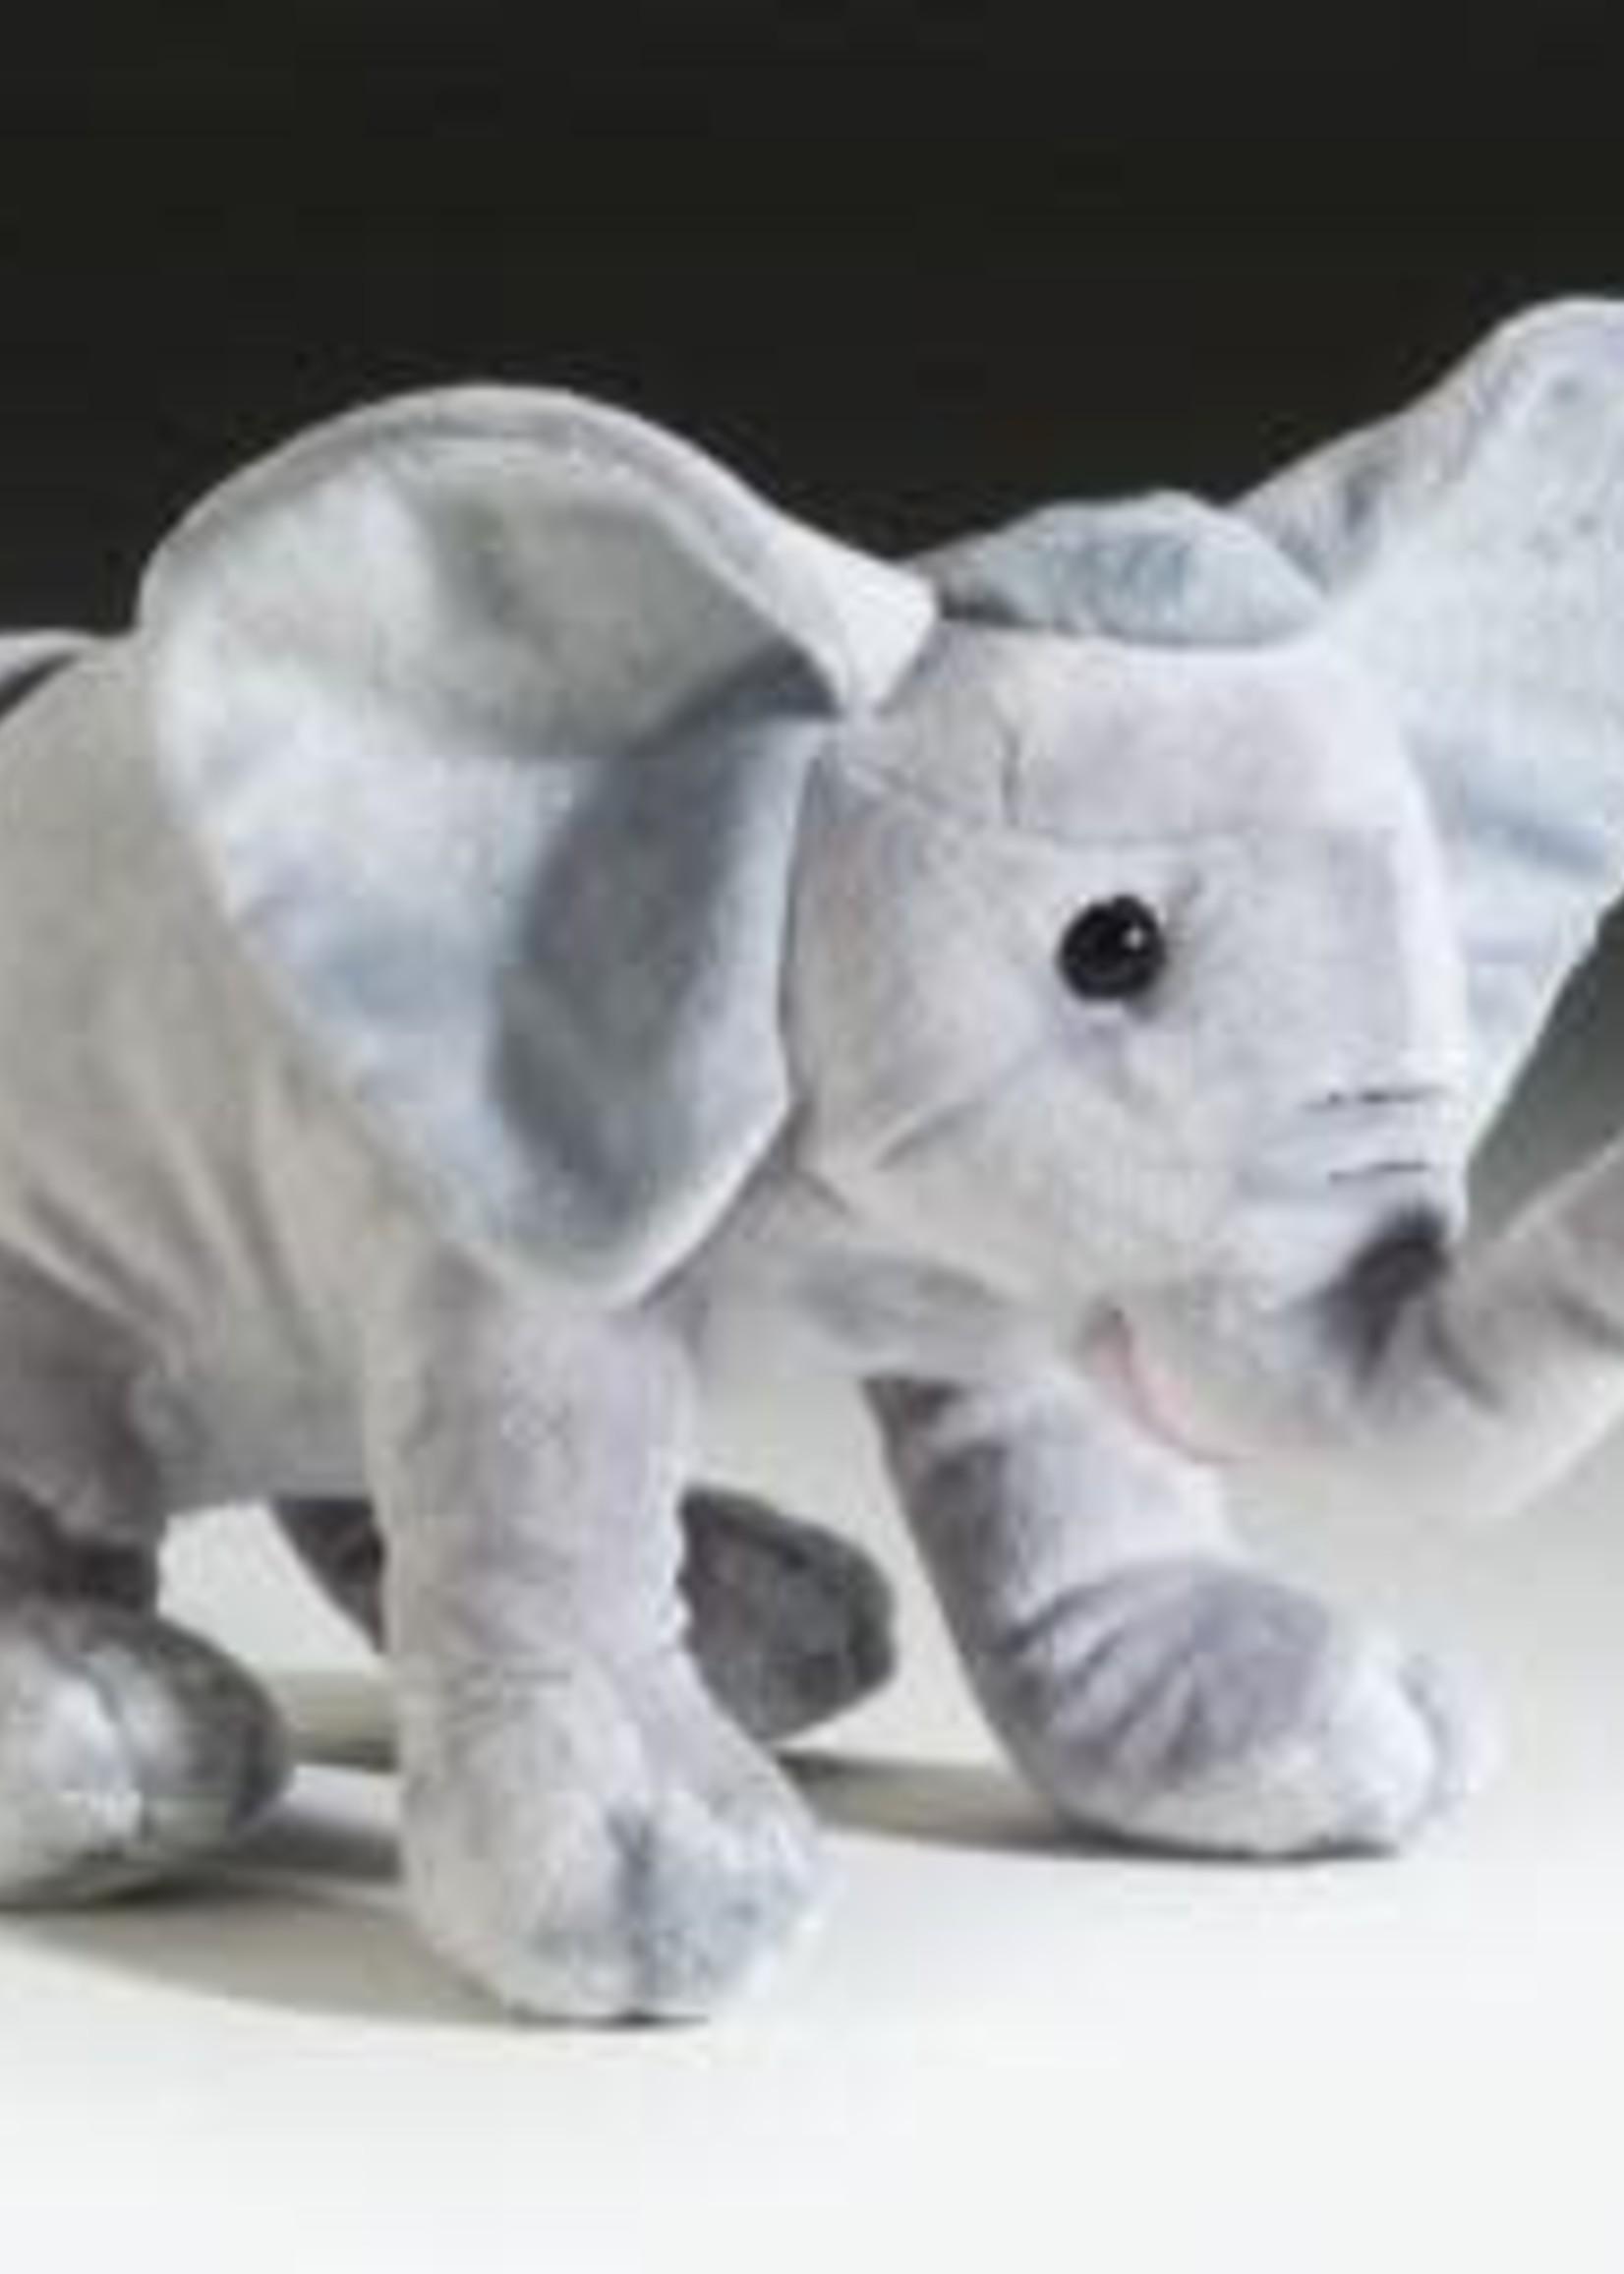 Warming Elephant - Ellie the Lavender Elephant